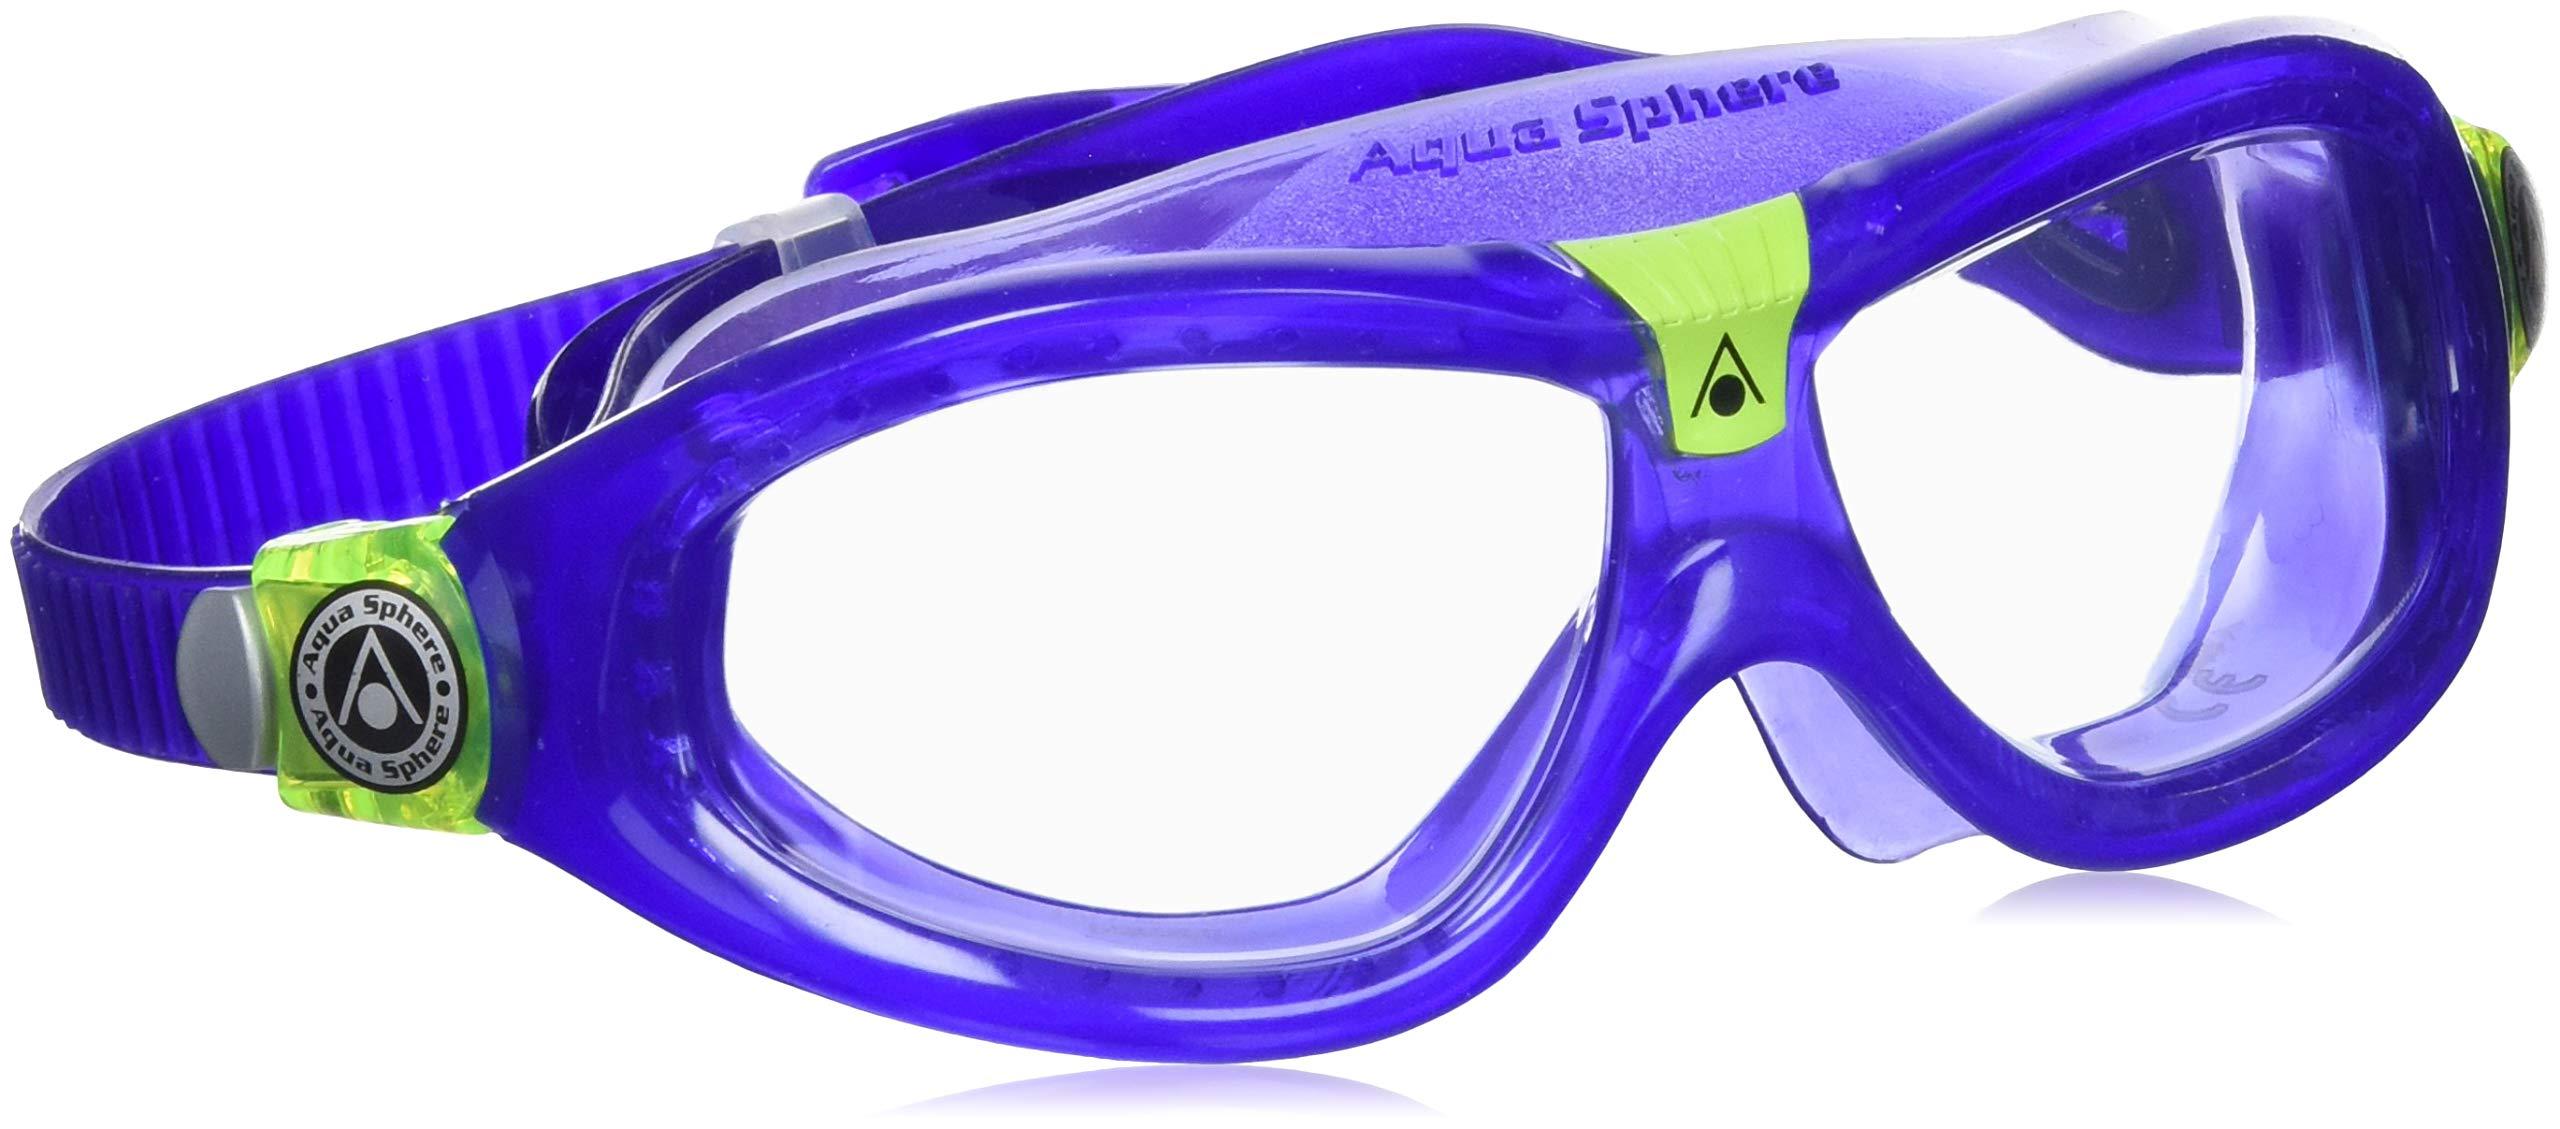 4da31532fb8 Aqua Sphere Seal Kid 2 Swim Goggle